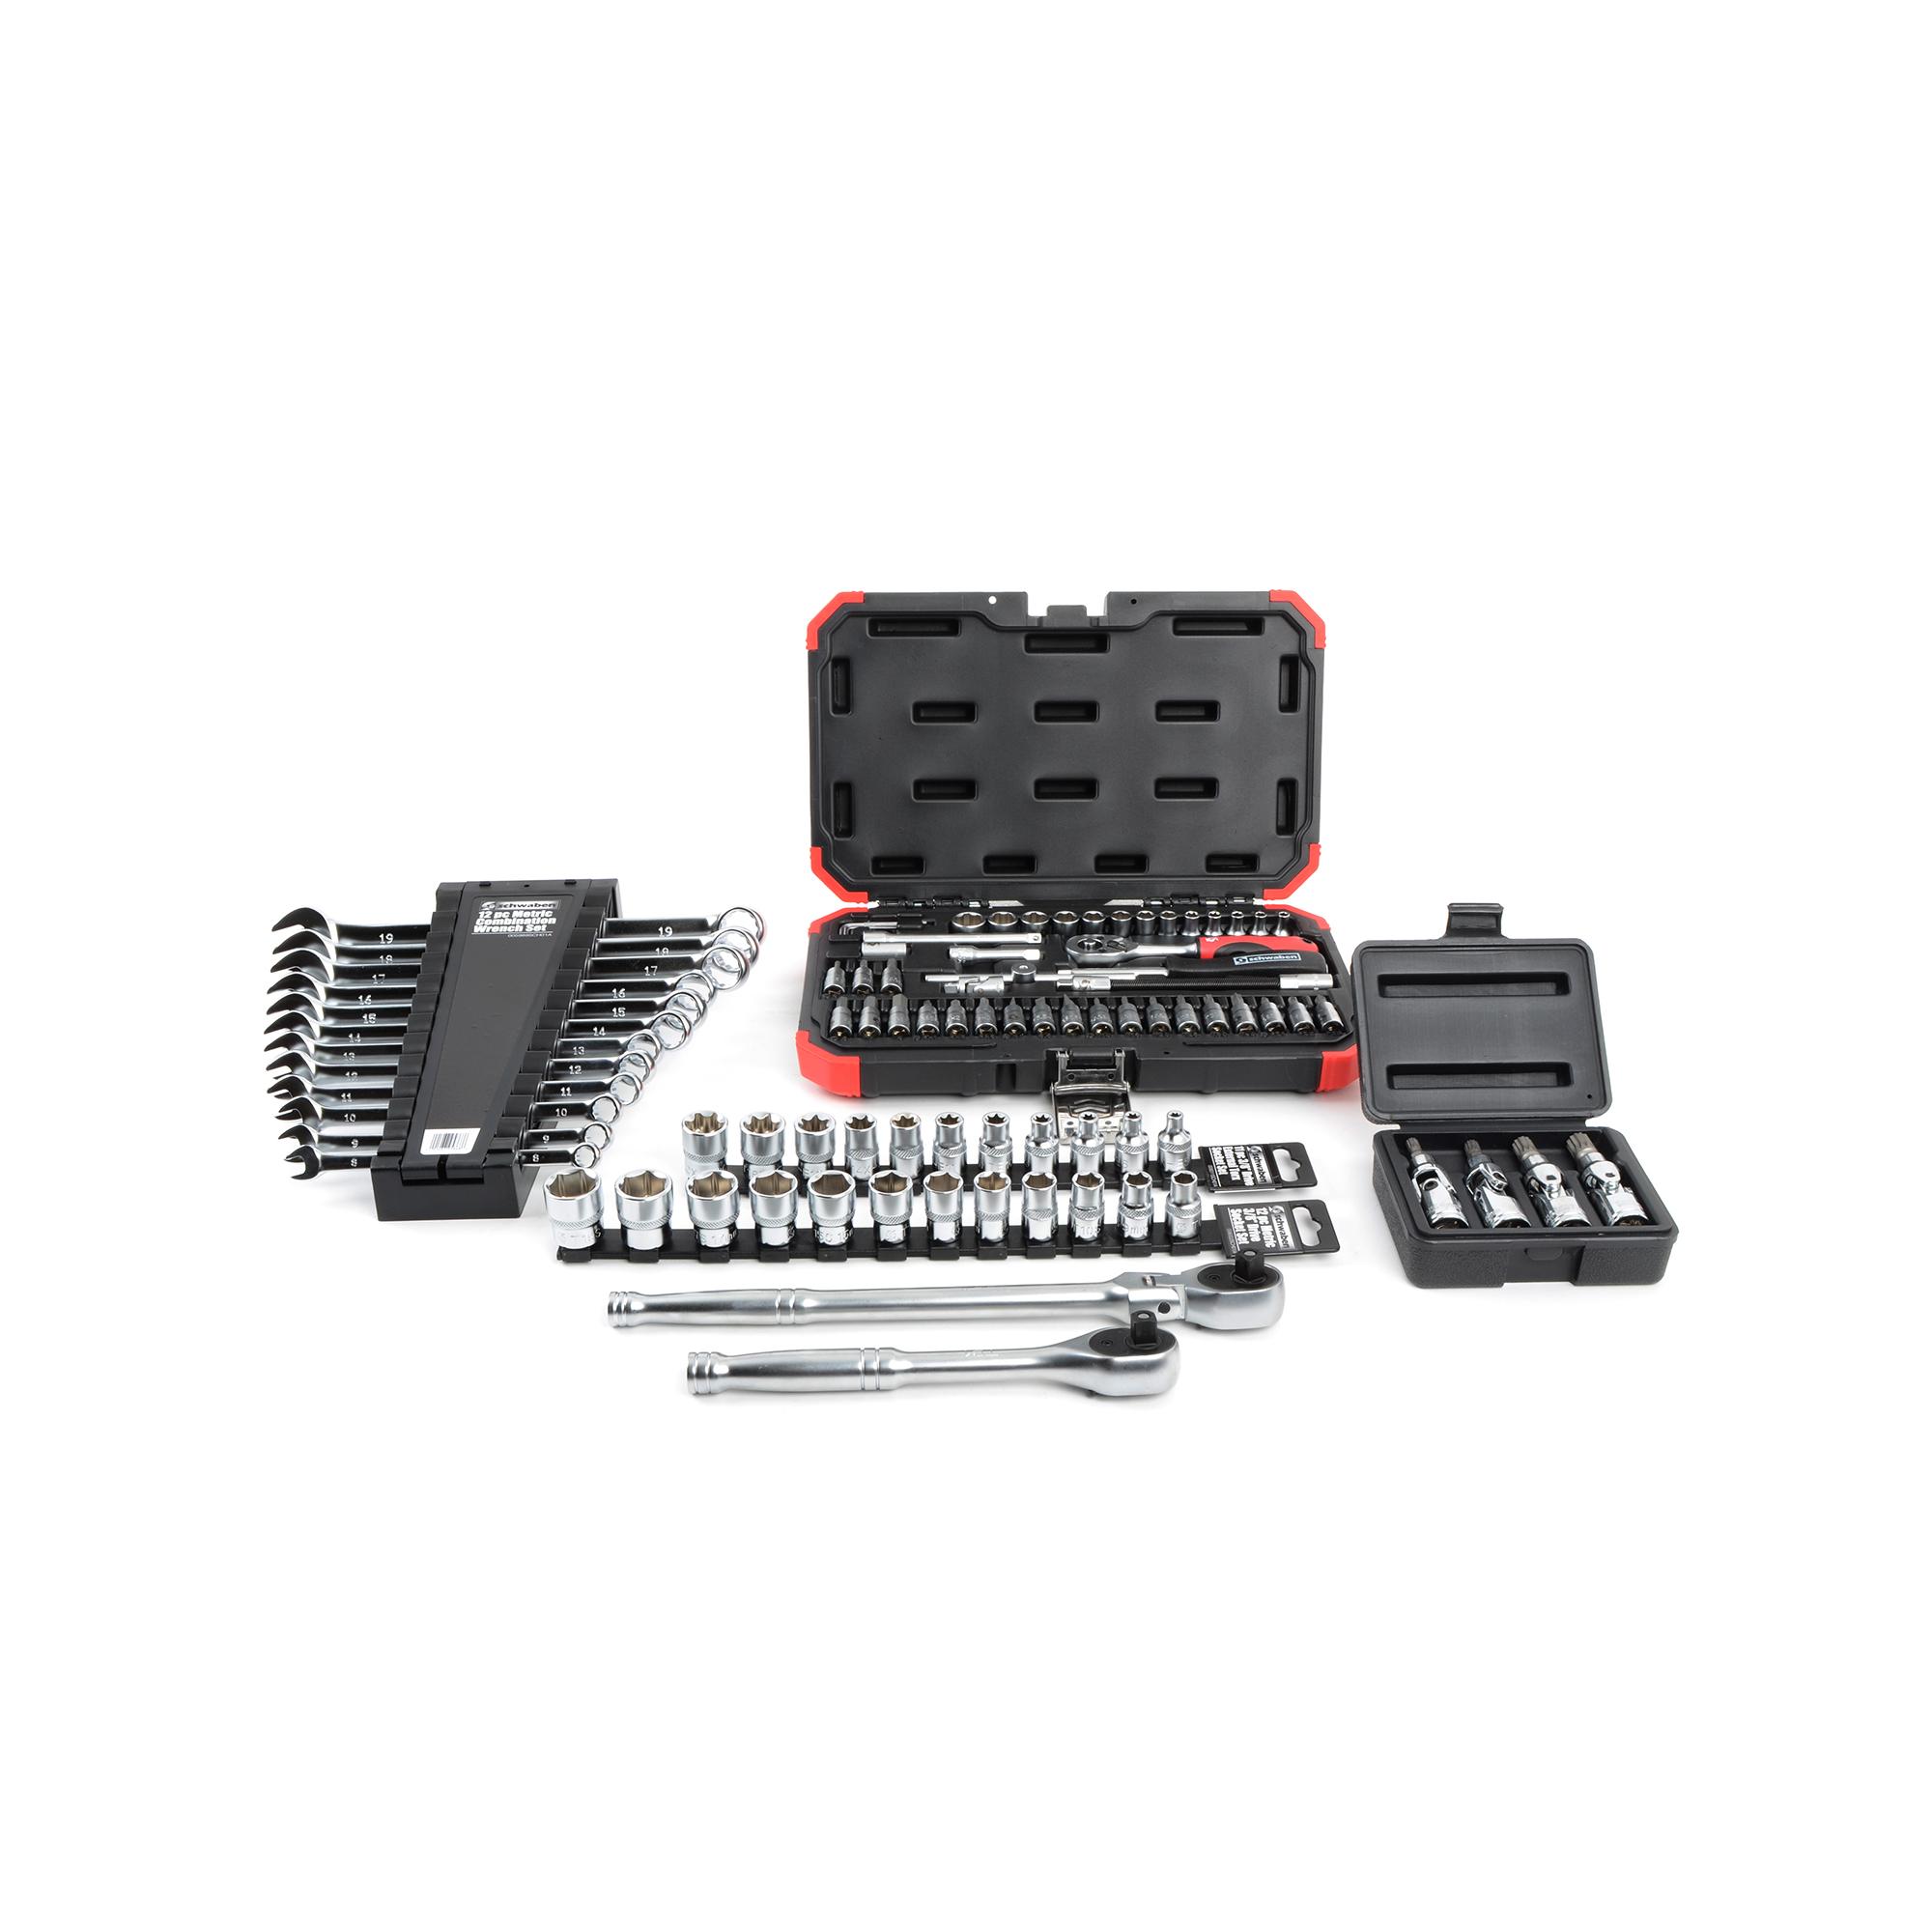 Schwaben European Hand Tool Starter Kit PartNumber: 00950687000P KsnValue: 1228557 MfgPartNumber: 005981SCH01AKT